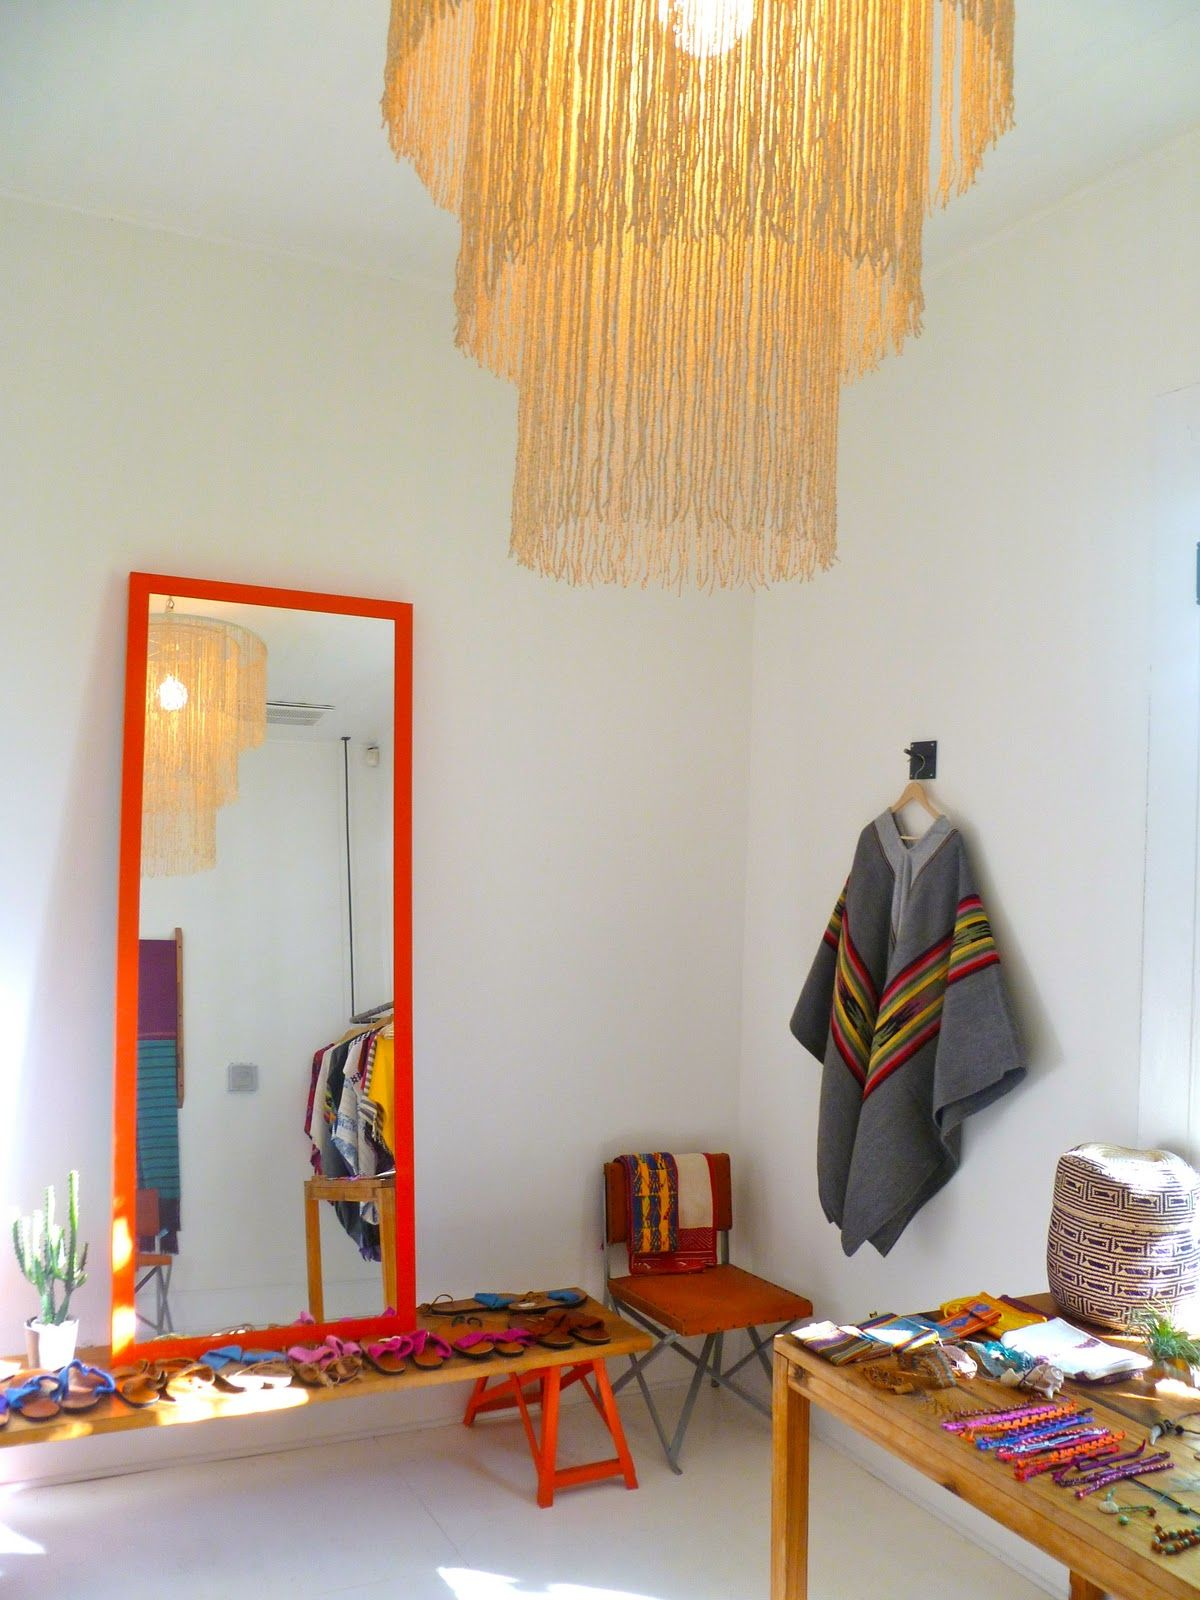 Astounding Jm Dry Goods Austin Tx Apartamento 302 Inexpensive Download Free Architecture Designs Grimeyleaguecom